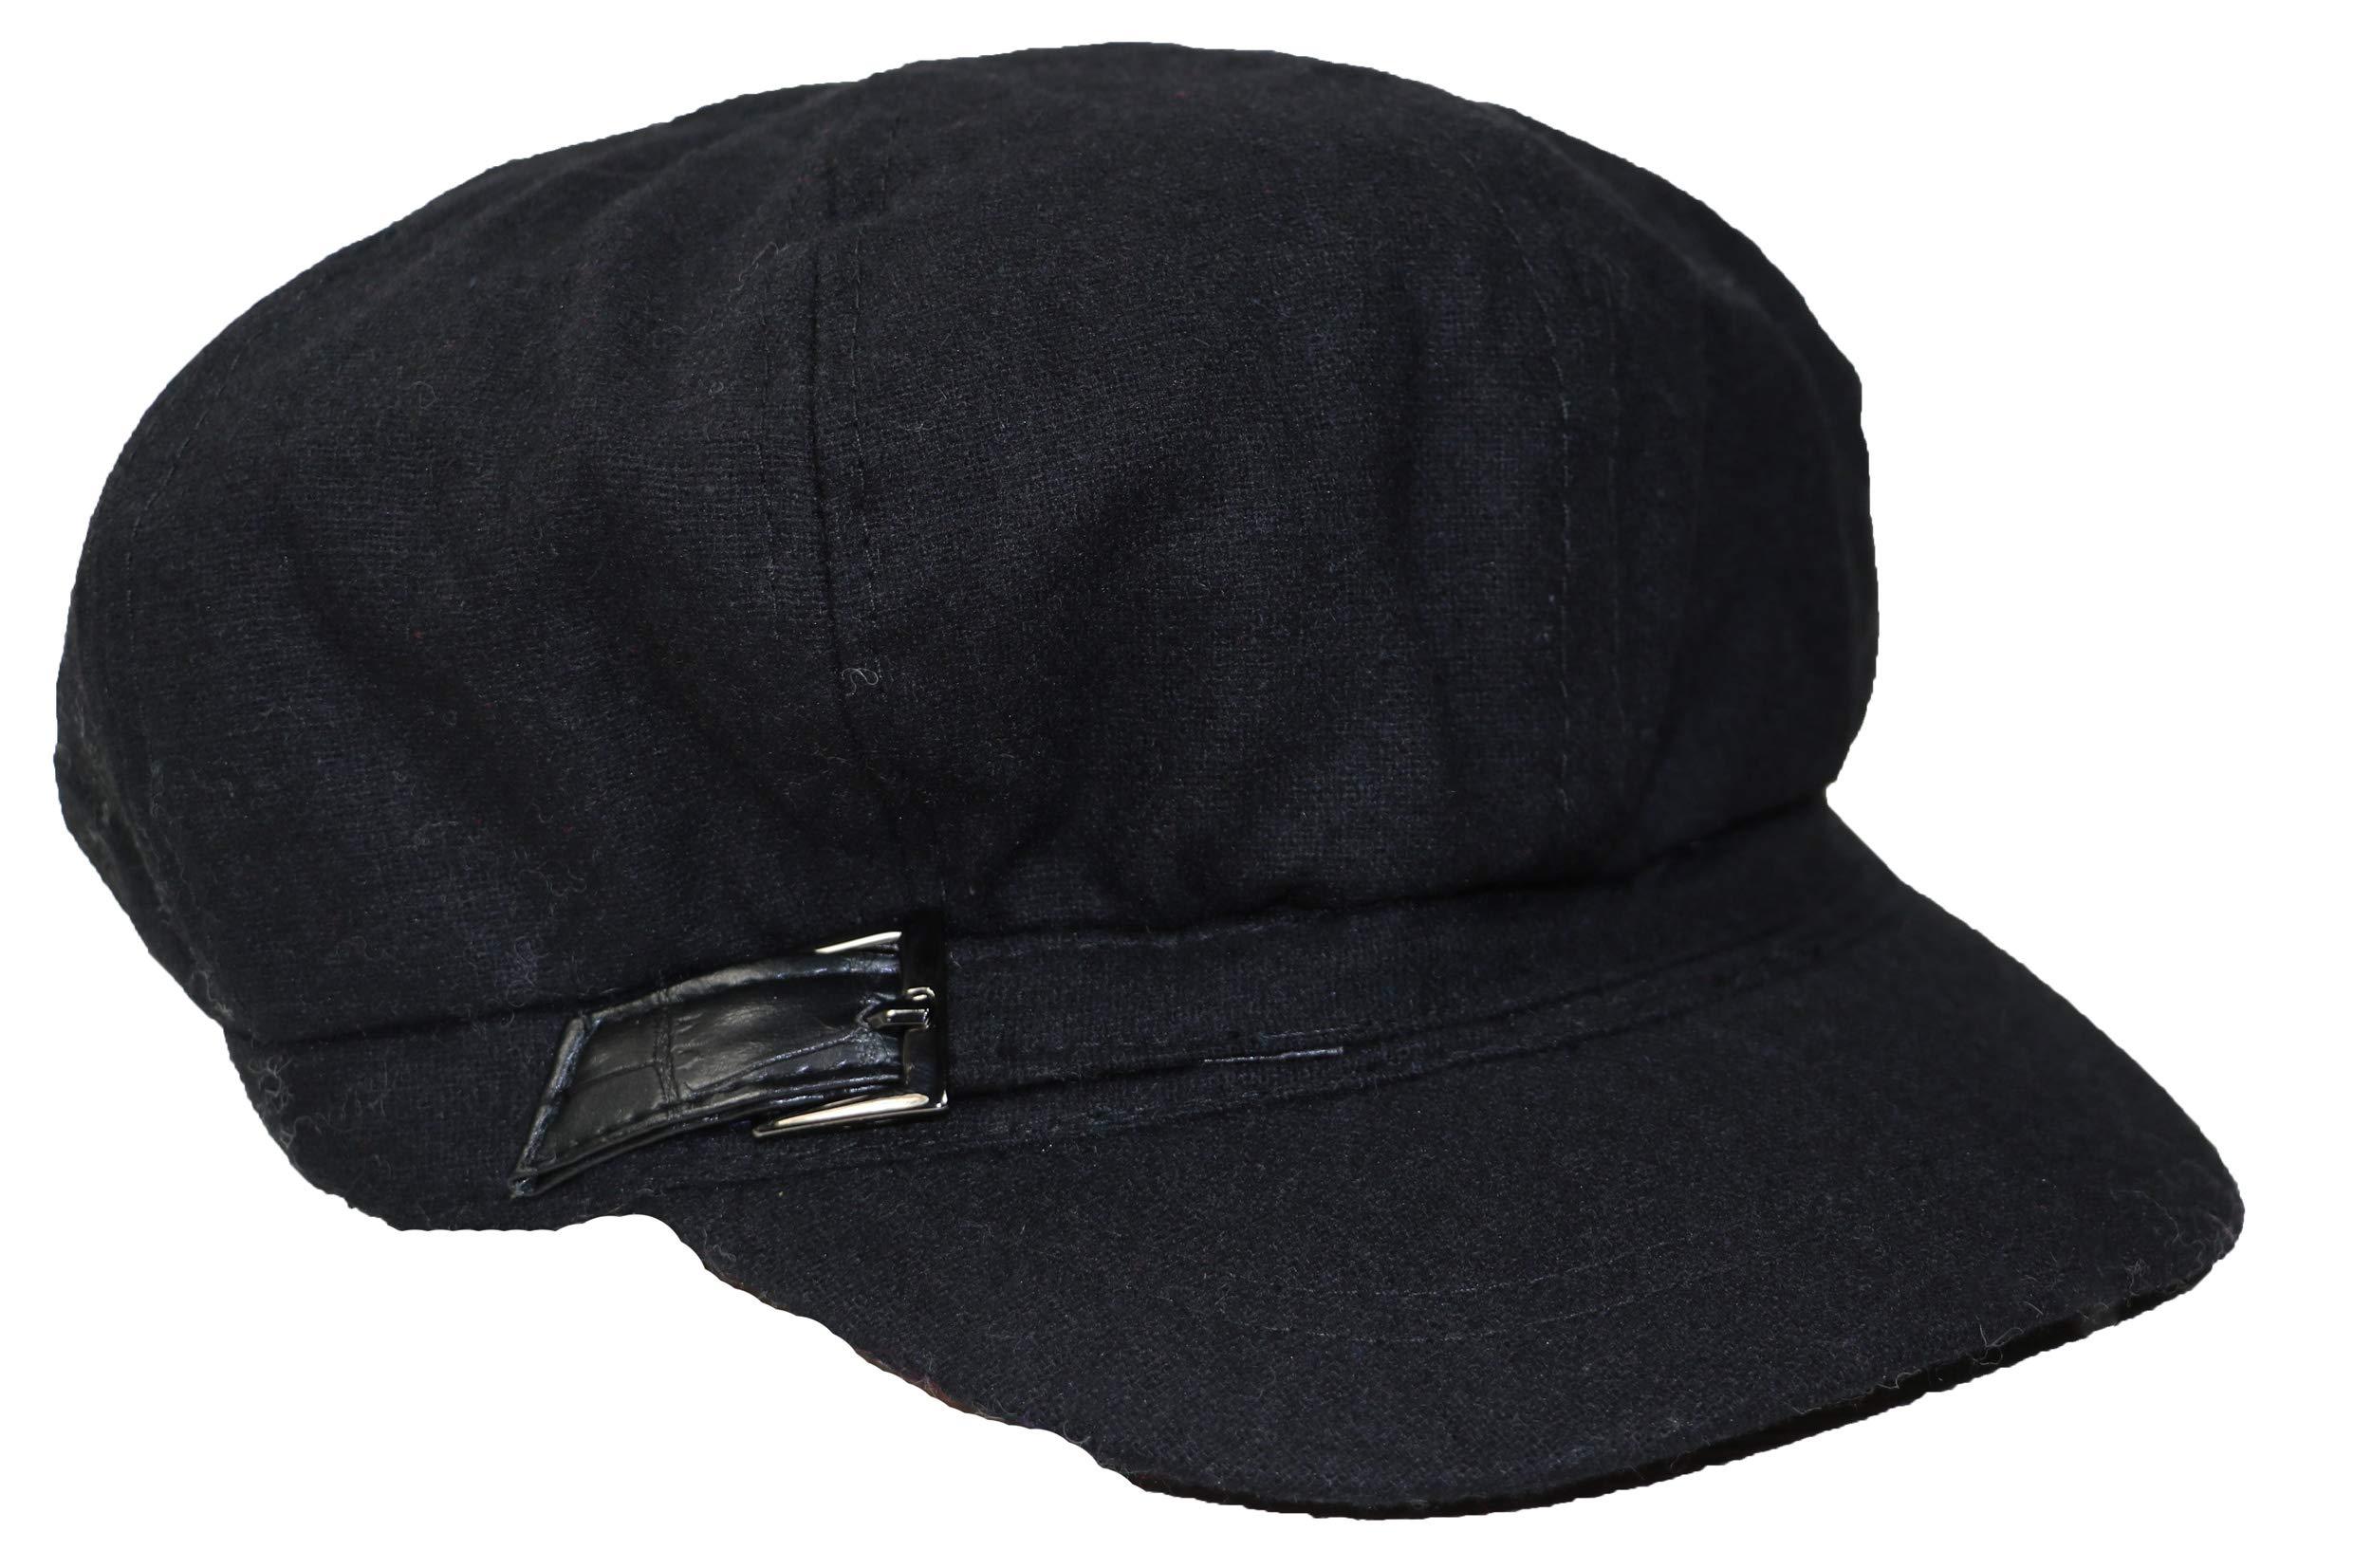 Nine West Women's Croco-Buckle Newsboy Hat, Black